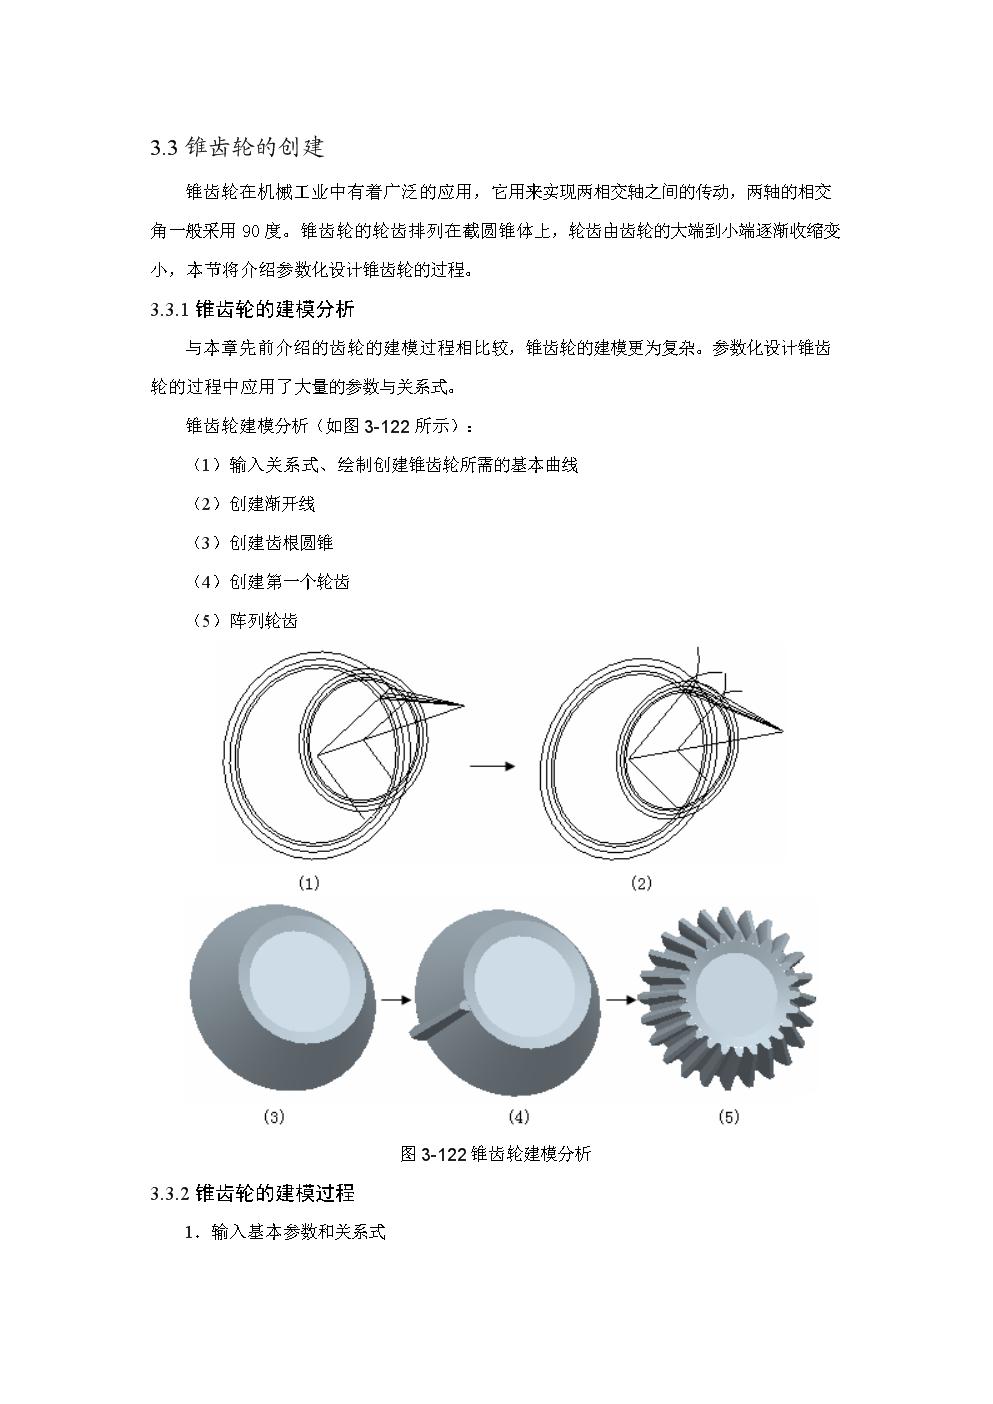 proe圆锥齿轮参数化画法讲义.doc图片